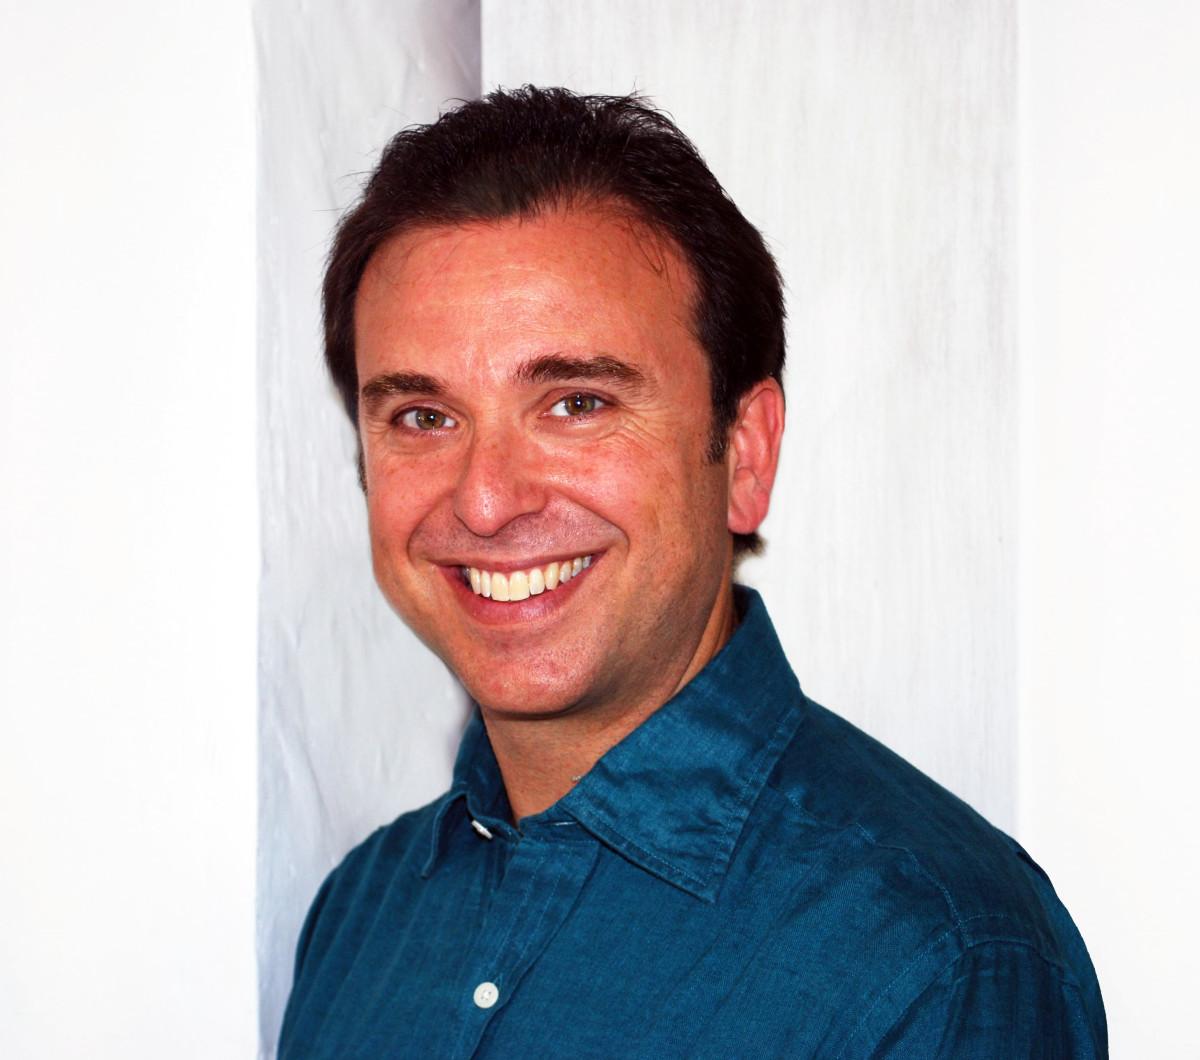 Eric Lipin, Amanae practitioner